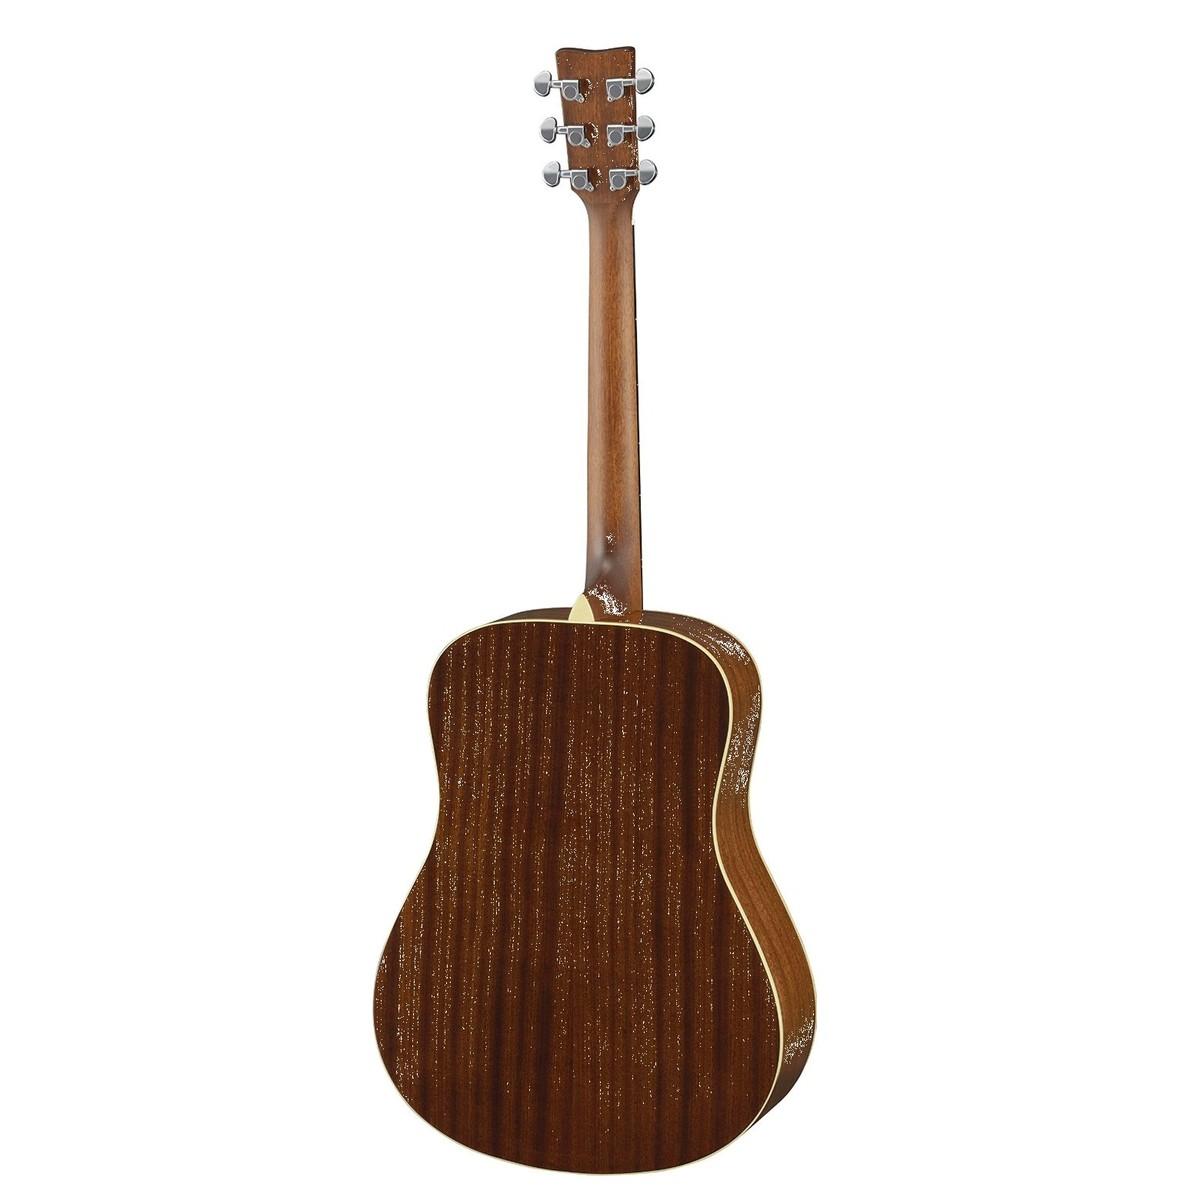 sonderangebot yamaha f370dw akustik gitarre sunburst auf. Black Bedroom Furniture Sets. Home Design Ideas